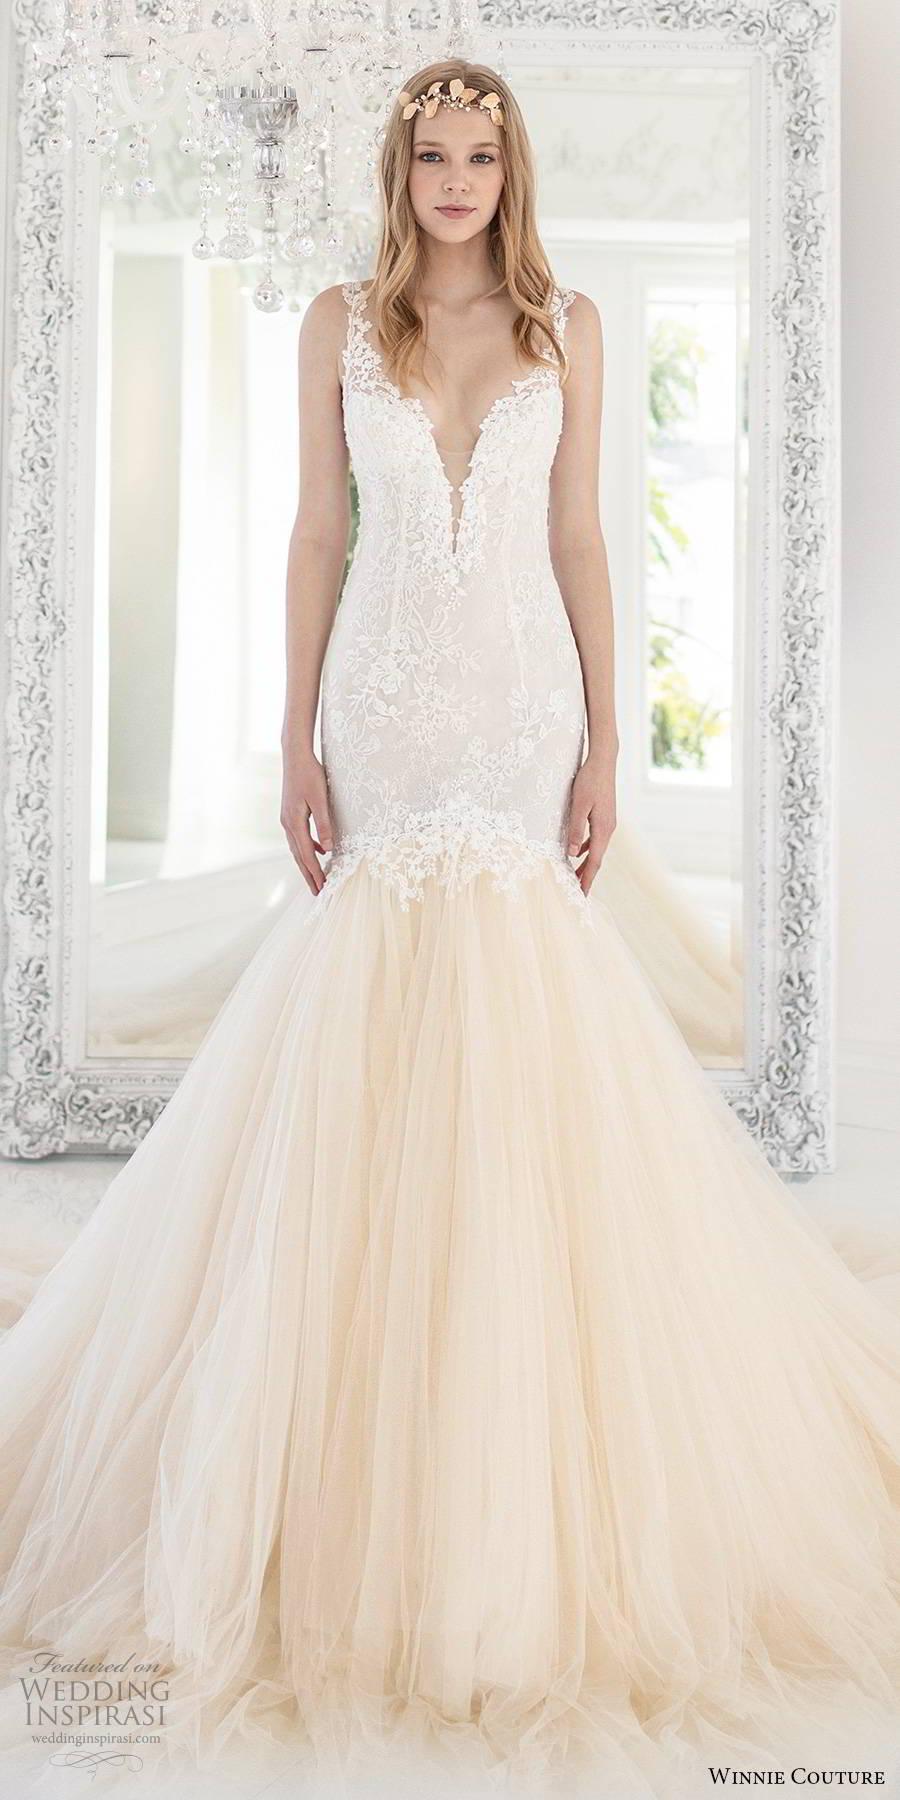 winnie couture 2019 bridal sleeveless illusion lace straps plunging v neckline embellished lace bodice fit flare mermaid wedding dress sheer back chapel train (10) mv